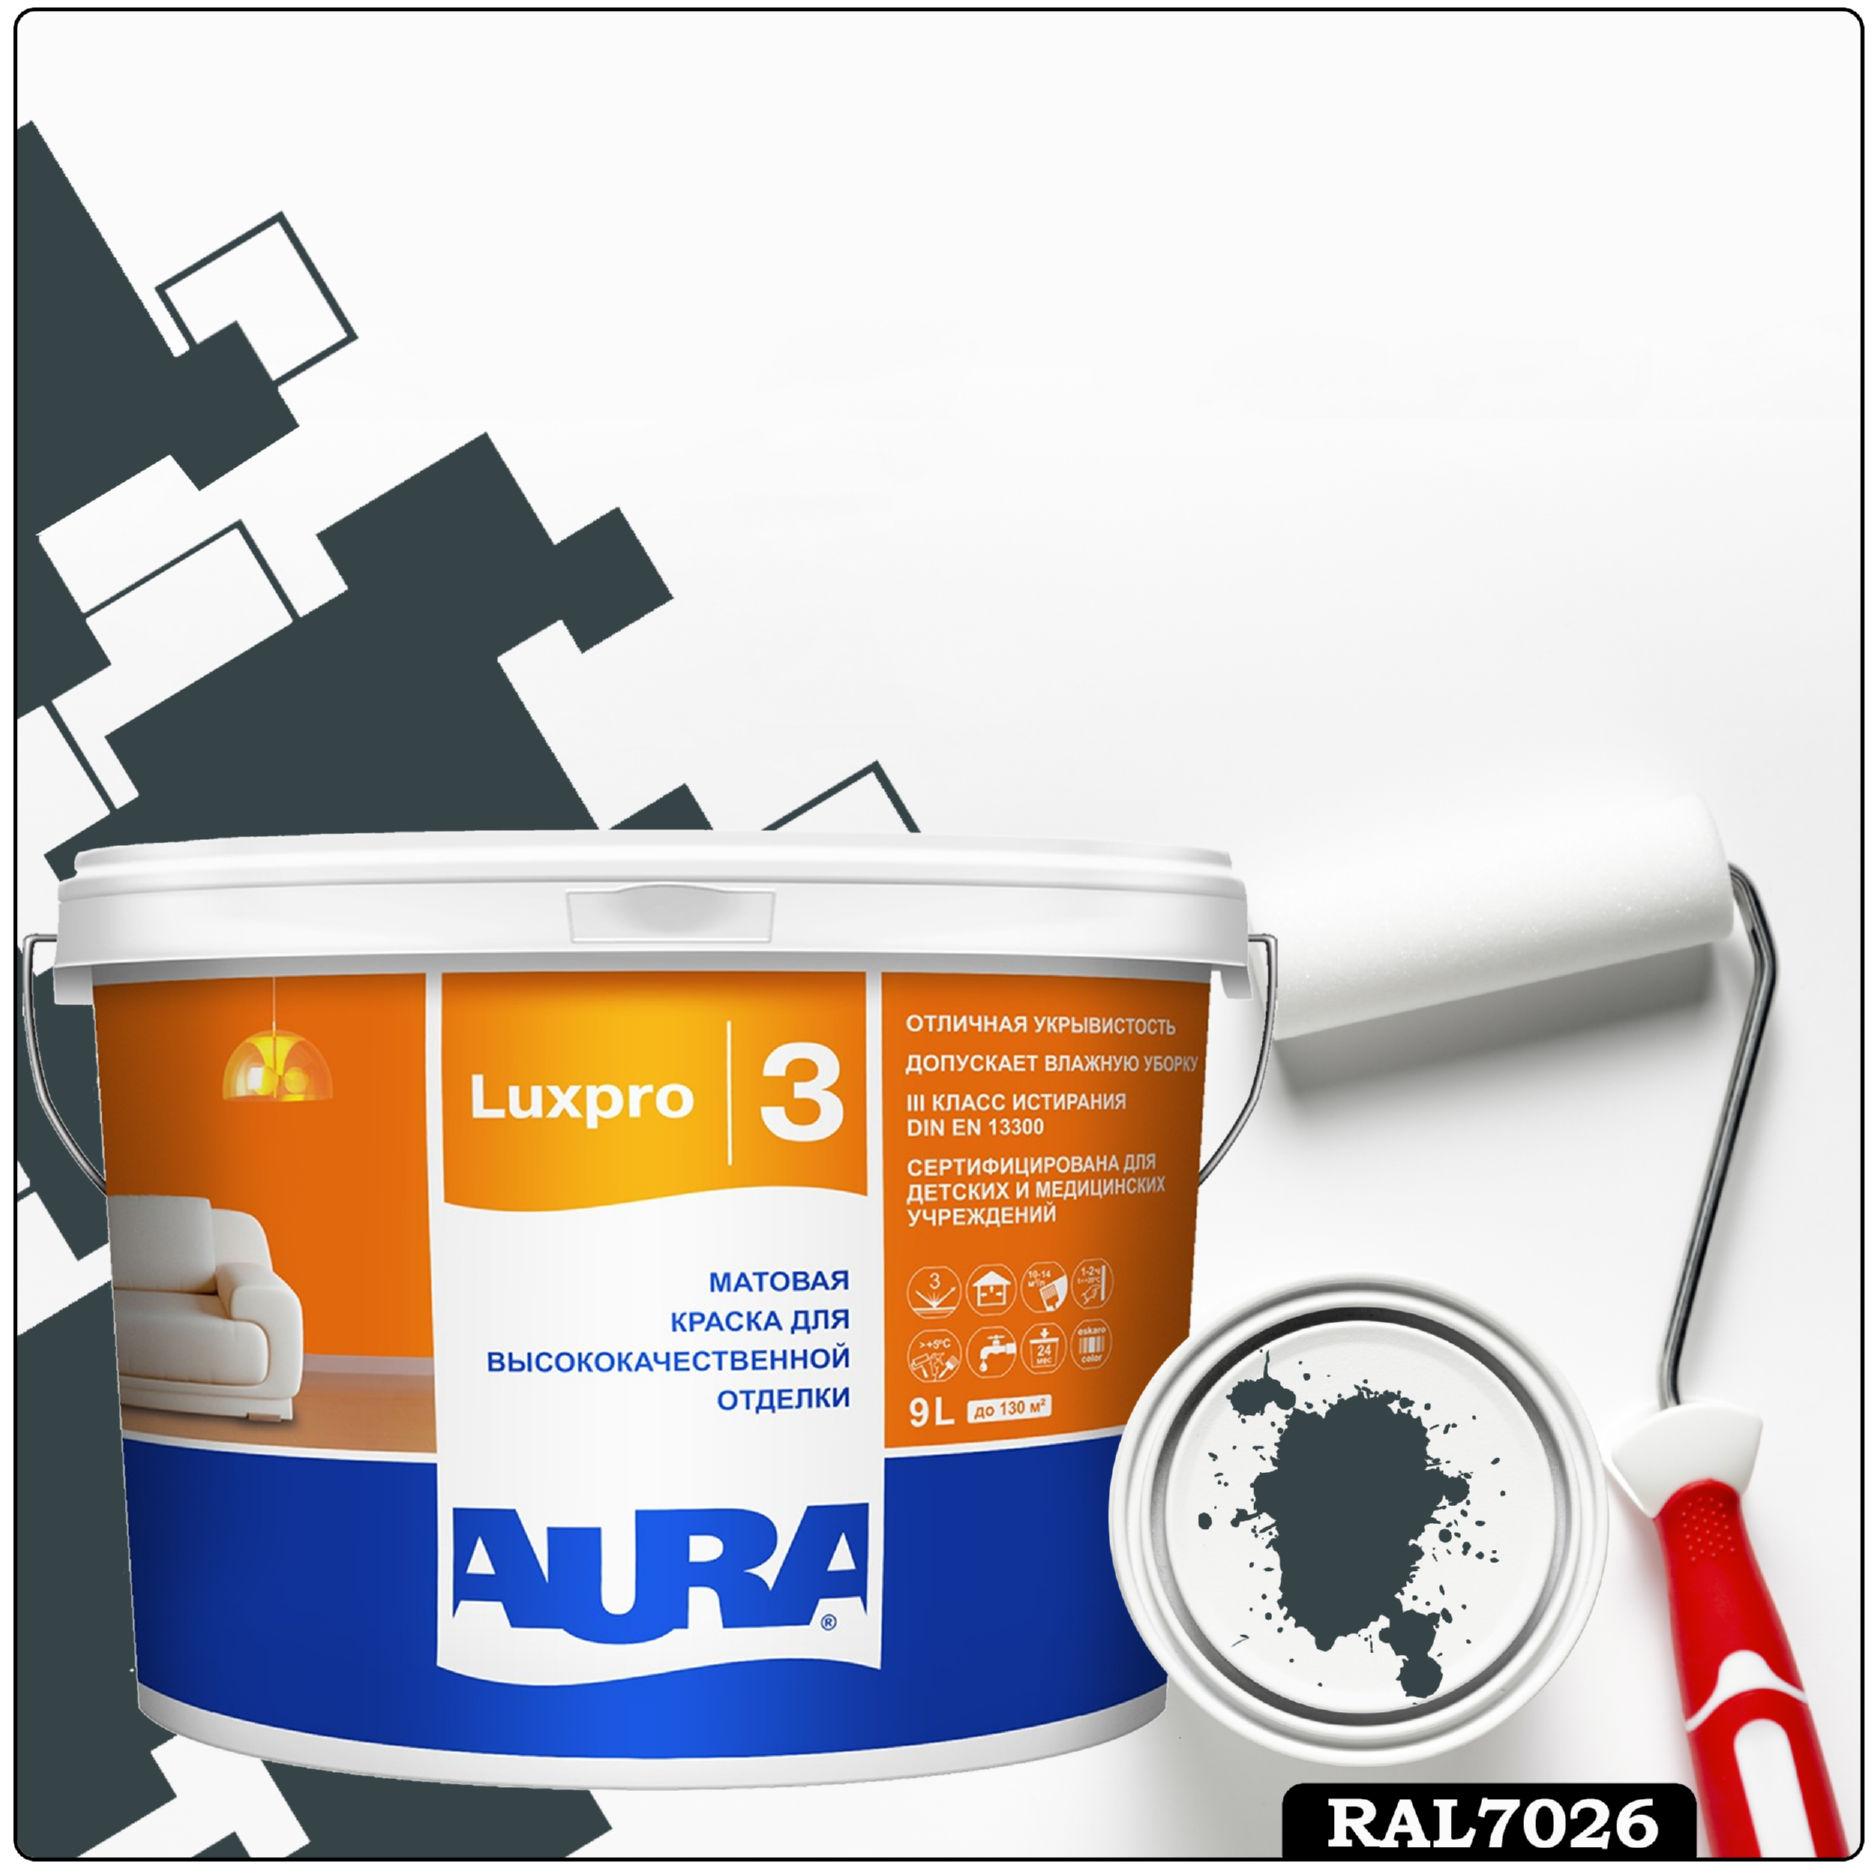 Фото 20 - Краска Aura LuxPRO 3, RAL 7026 Серый гранит, латексная, шелково-матовая, интерьерная, 9л, Аура.